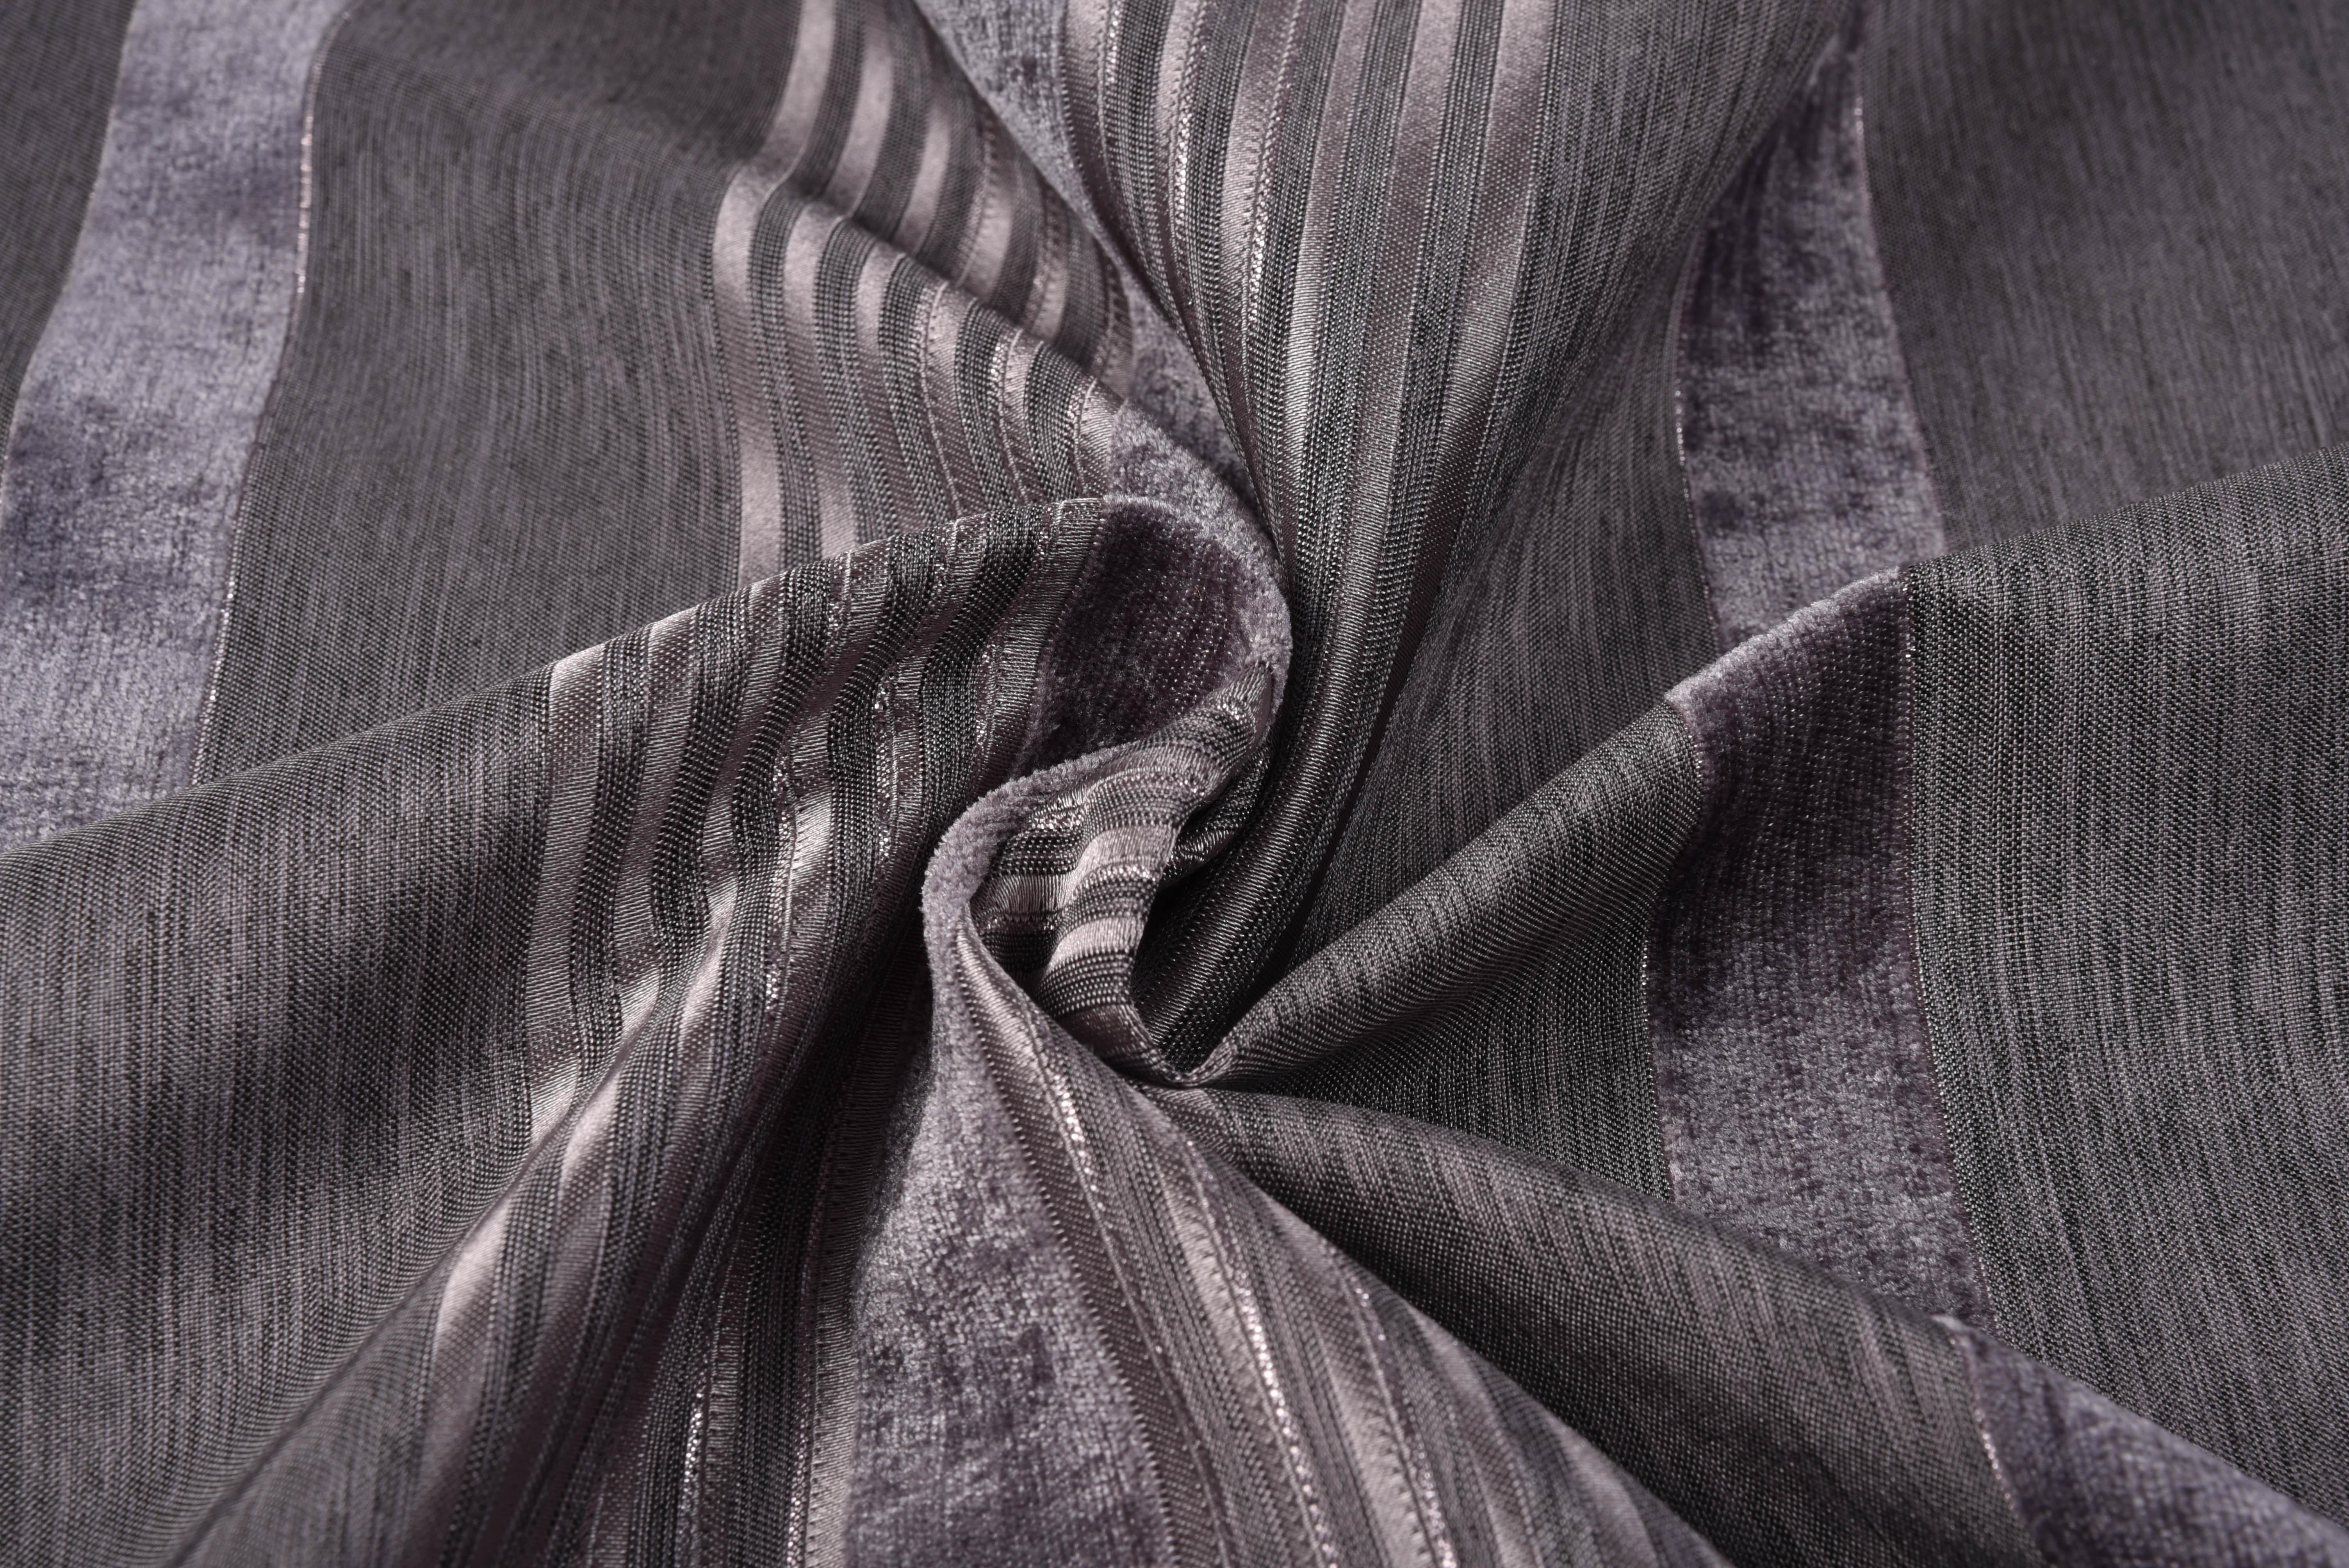 {} TexRepublic Материал Жаккард Strips Single Цвет: Серый серый вислоухий котнок цена